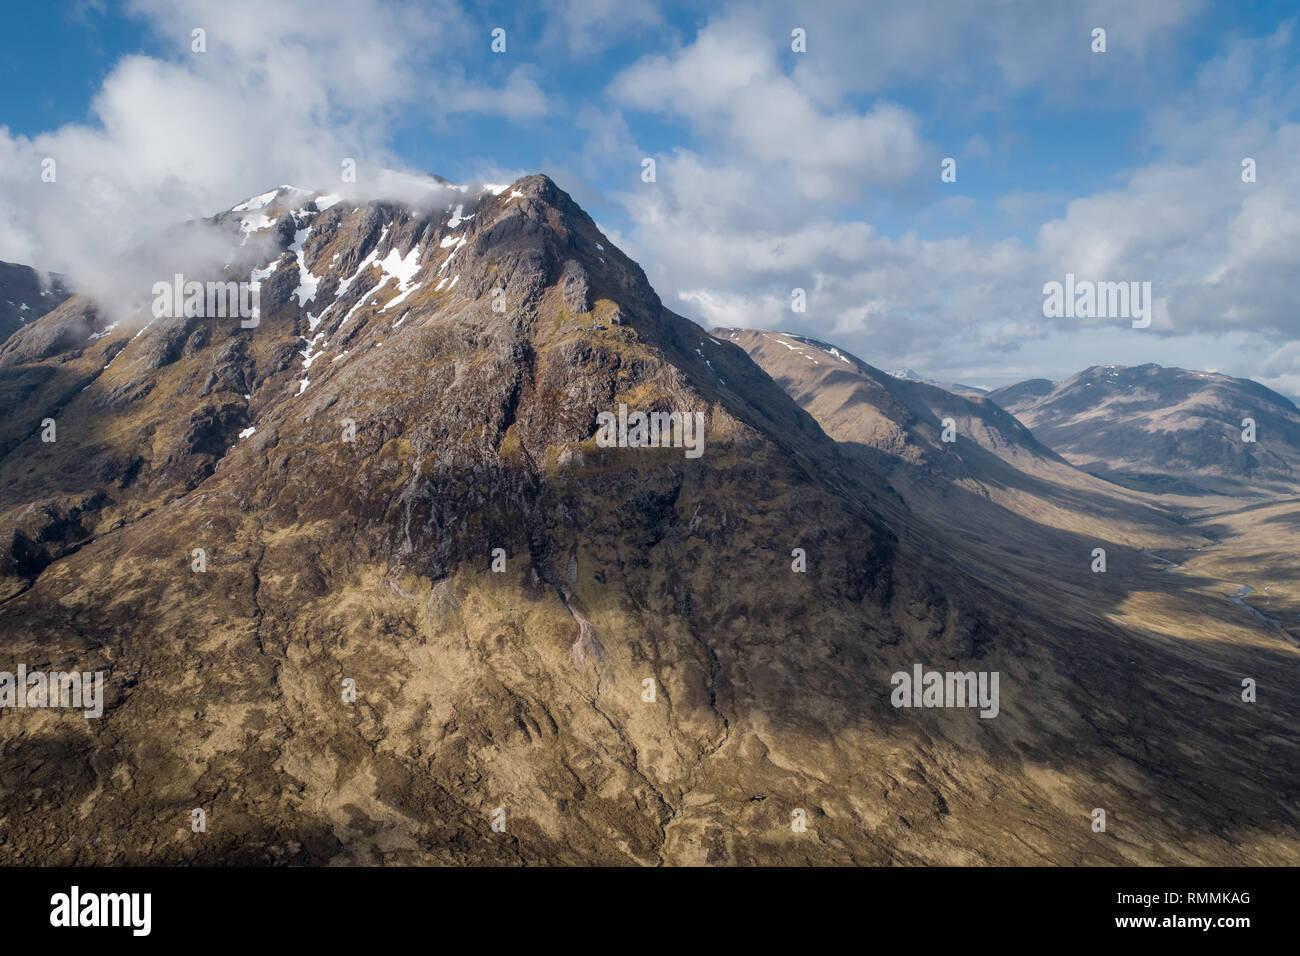 Mountain peaks at the entrance to Glen Etive, near Glencoe in the Scottish Highlands. - Stock Image